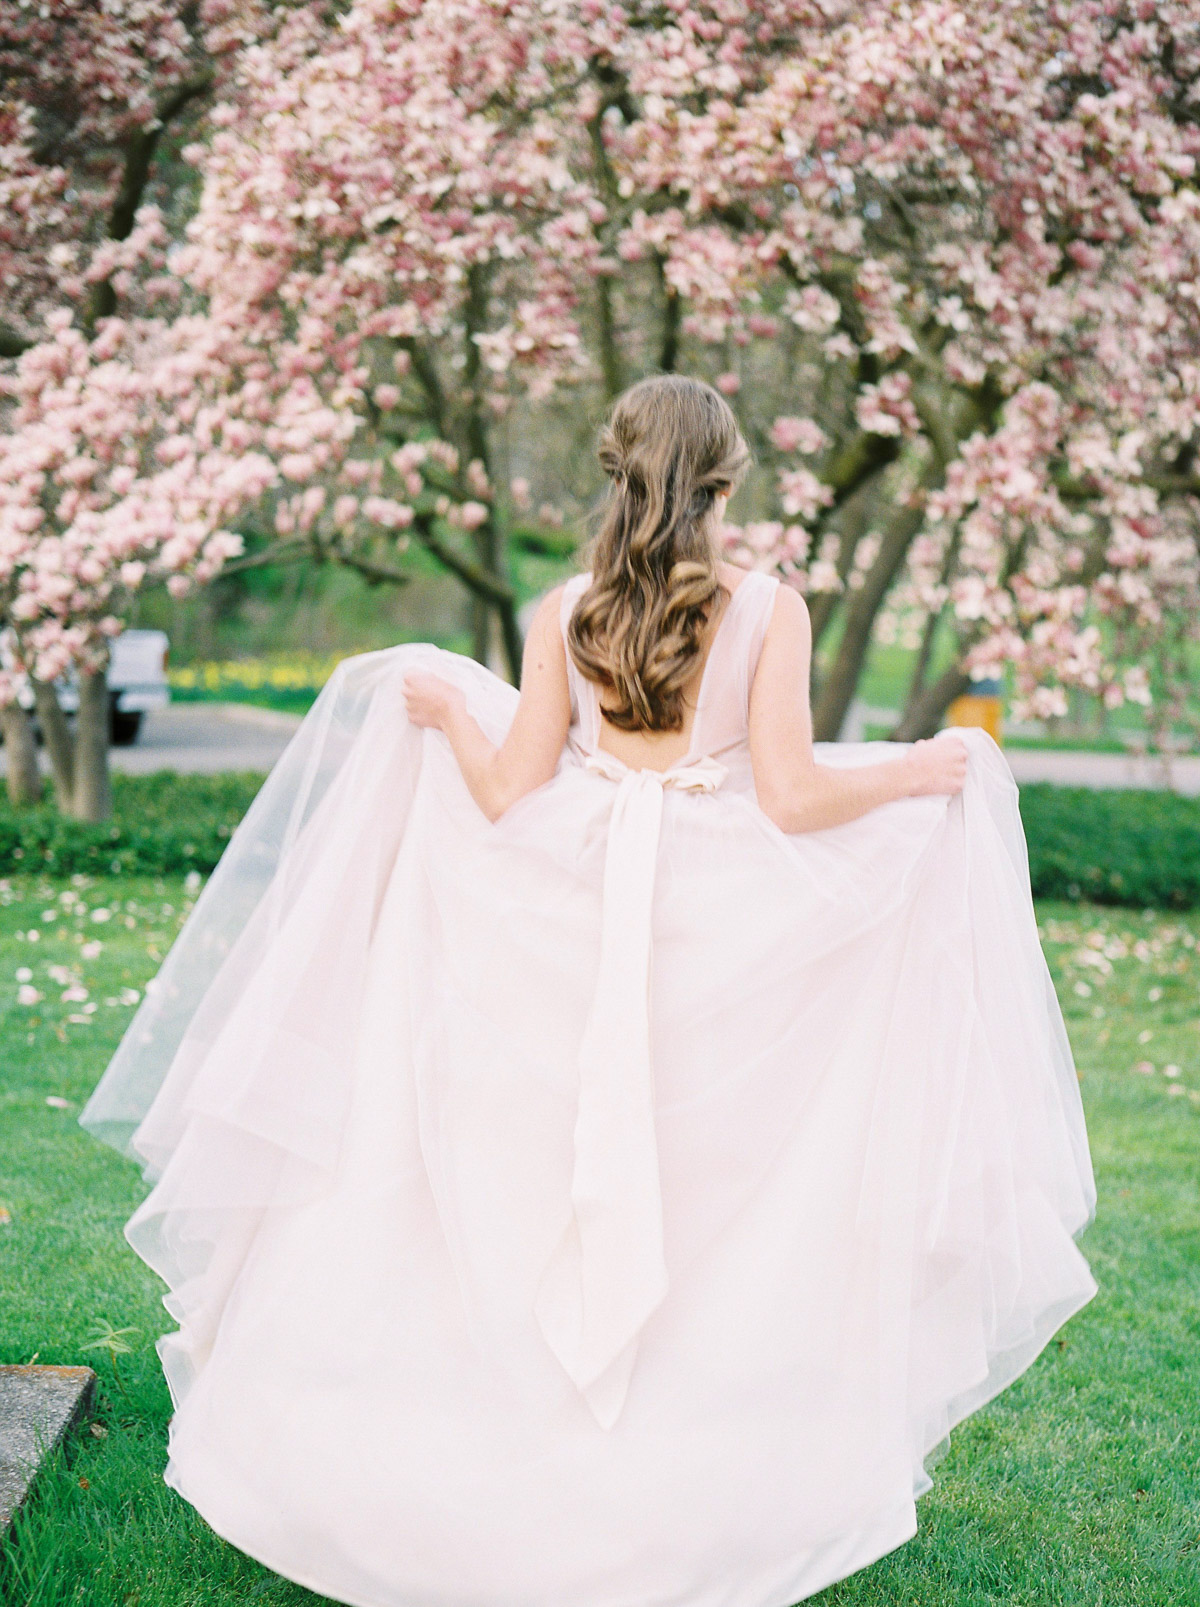 julia-park-photography-vineyard-bride-swish-list-niagara-on-the-lake-wedding-editorial-28.jpg